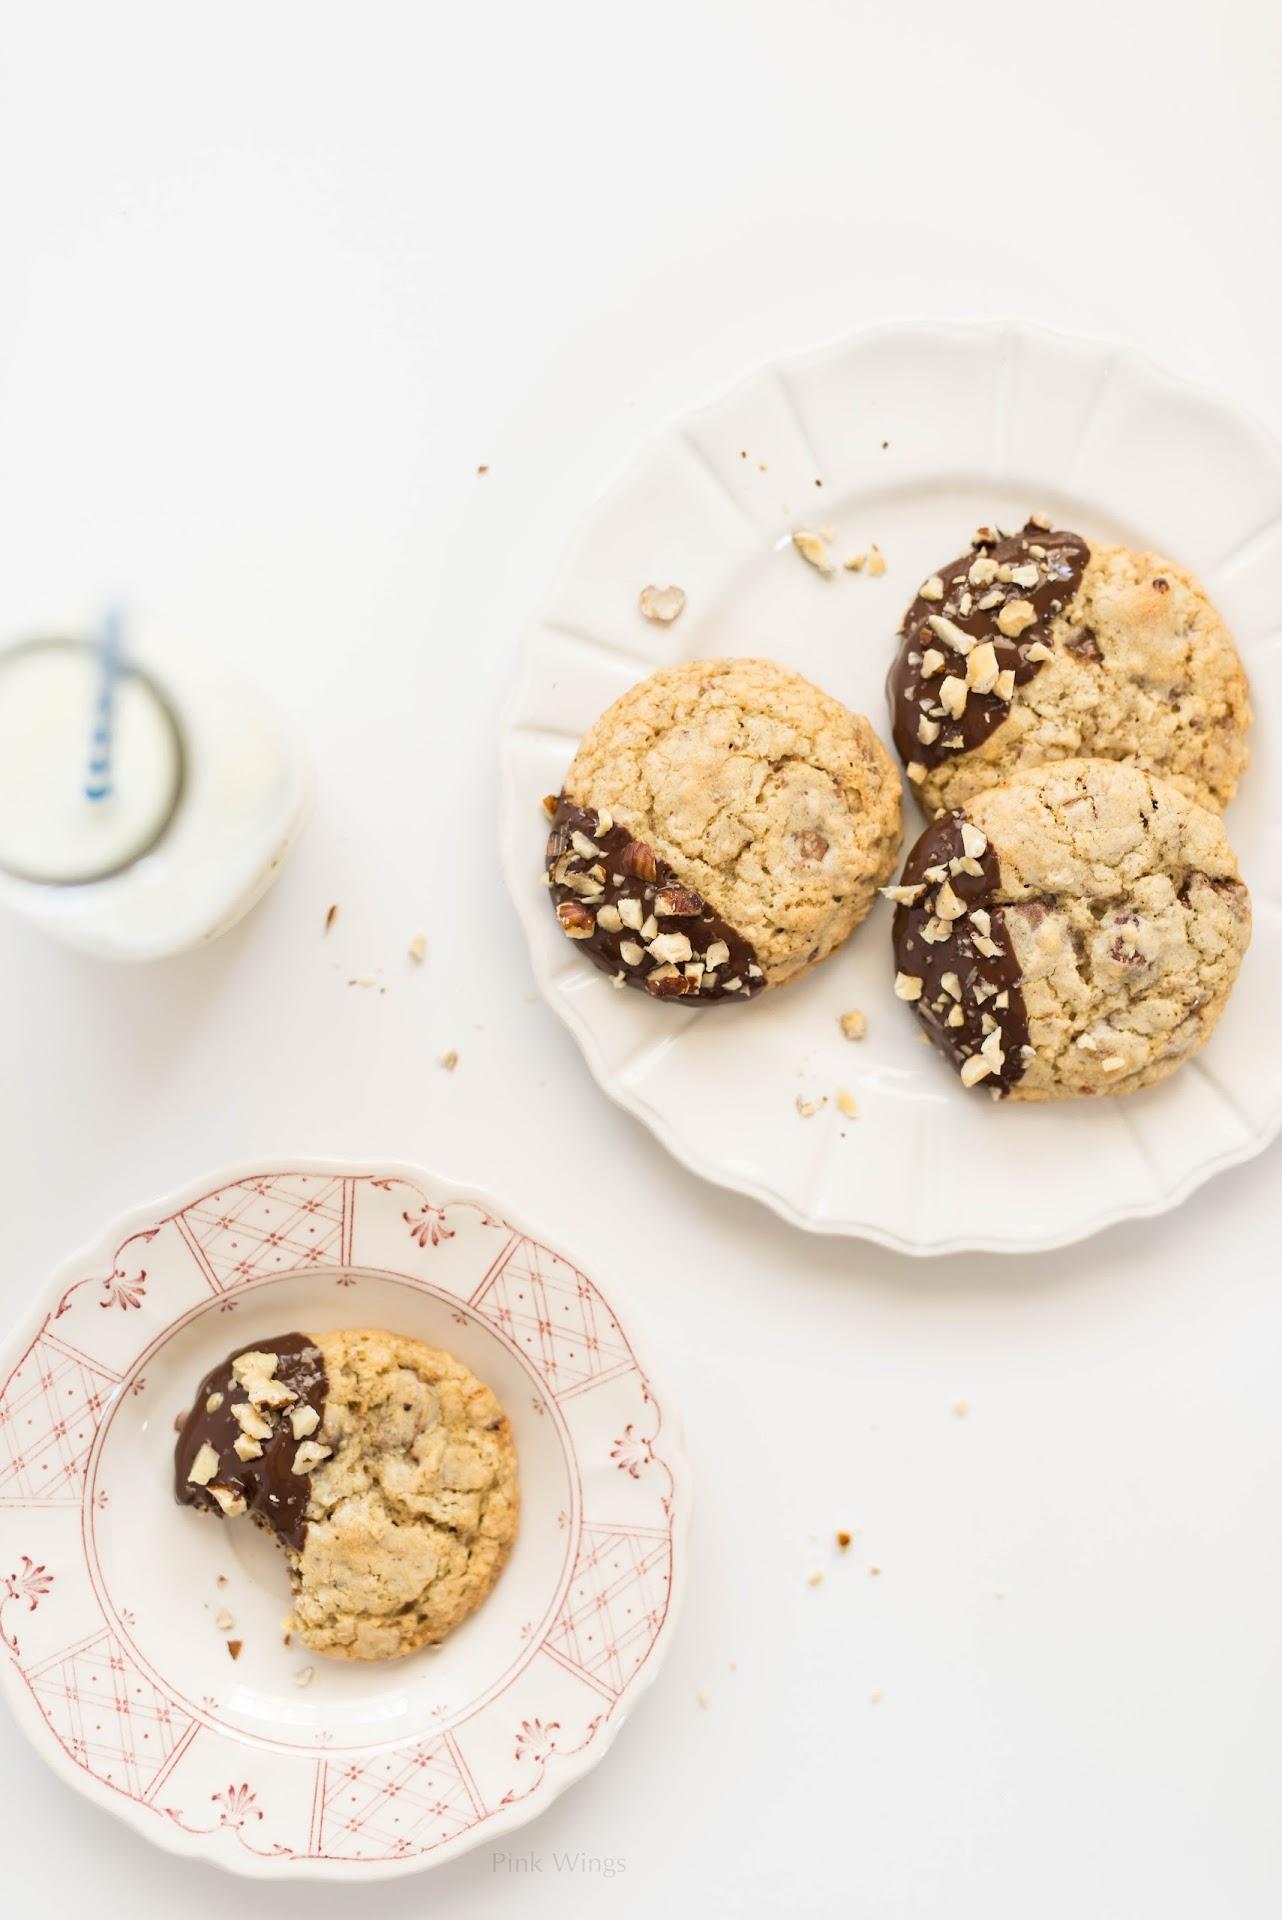 dipped cookies, recipe, dark chocolate, toffee, hazelnuts